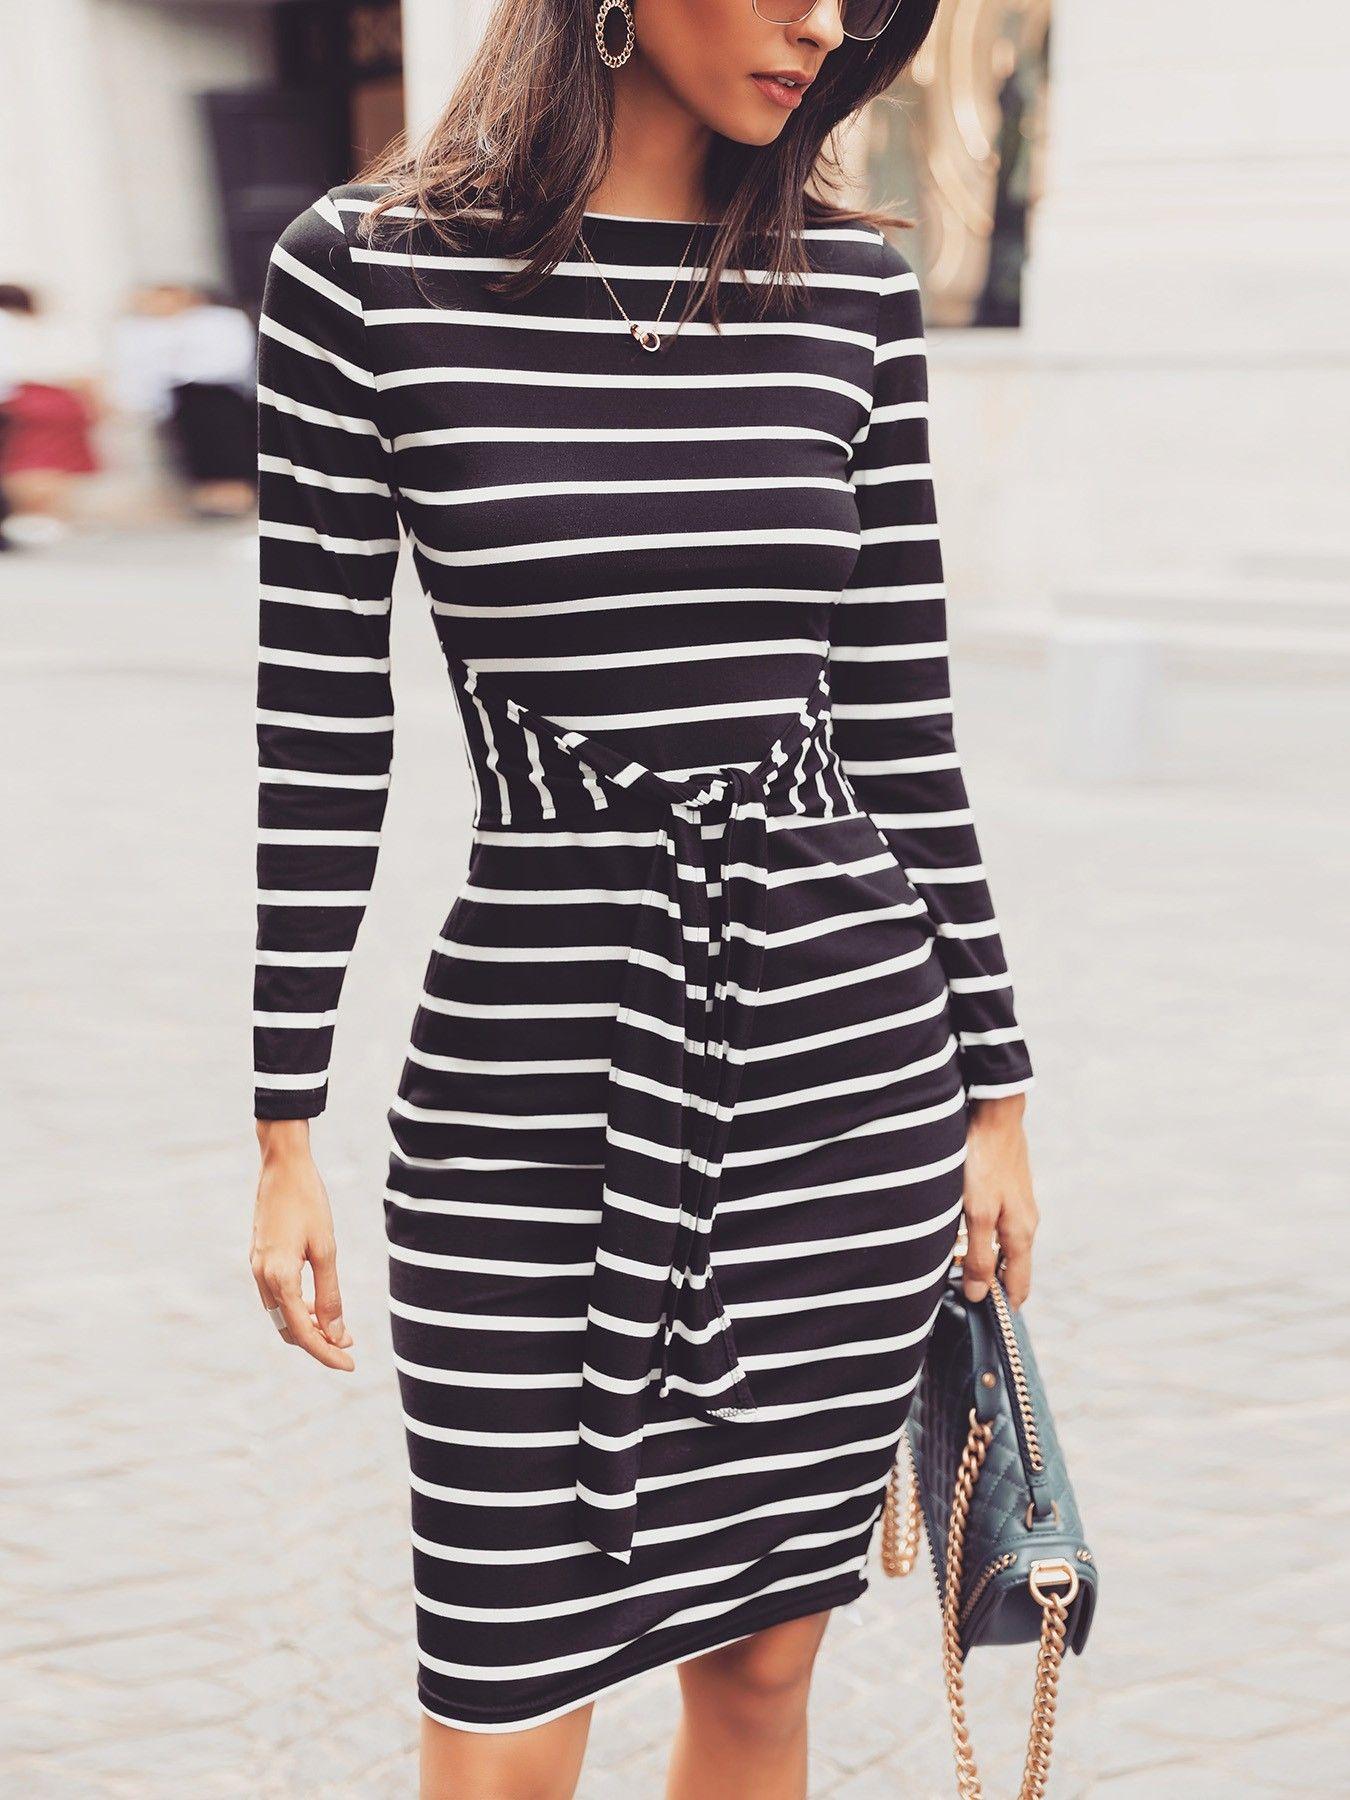 Striped Long Sleeve Tied Waist Casual Dress Casual Dresses For Women Casual Dresses Mini Dress Casual [ 1800 x 1350 Pixel ]